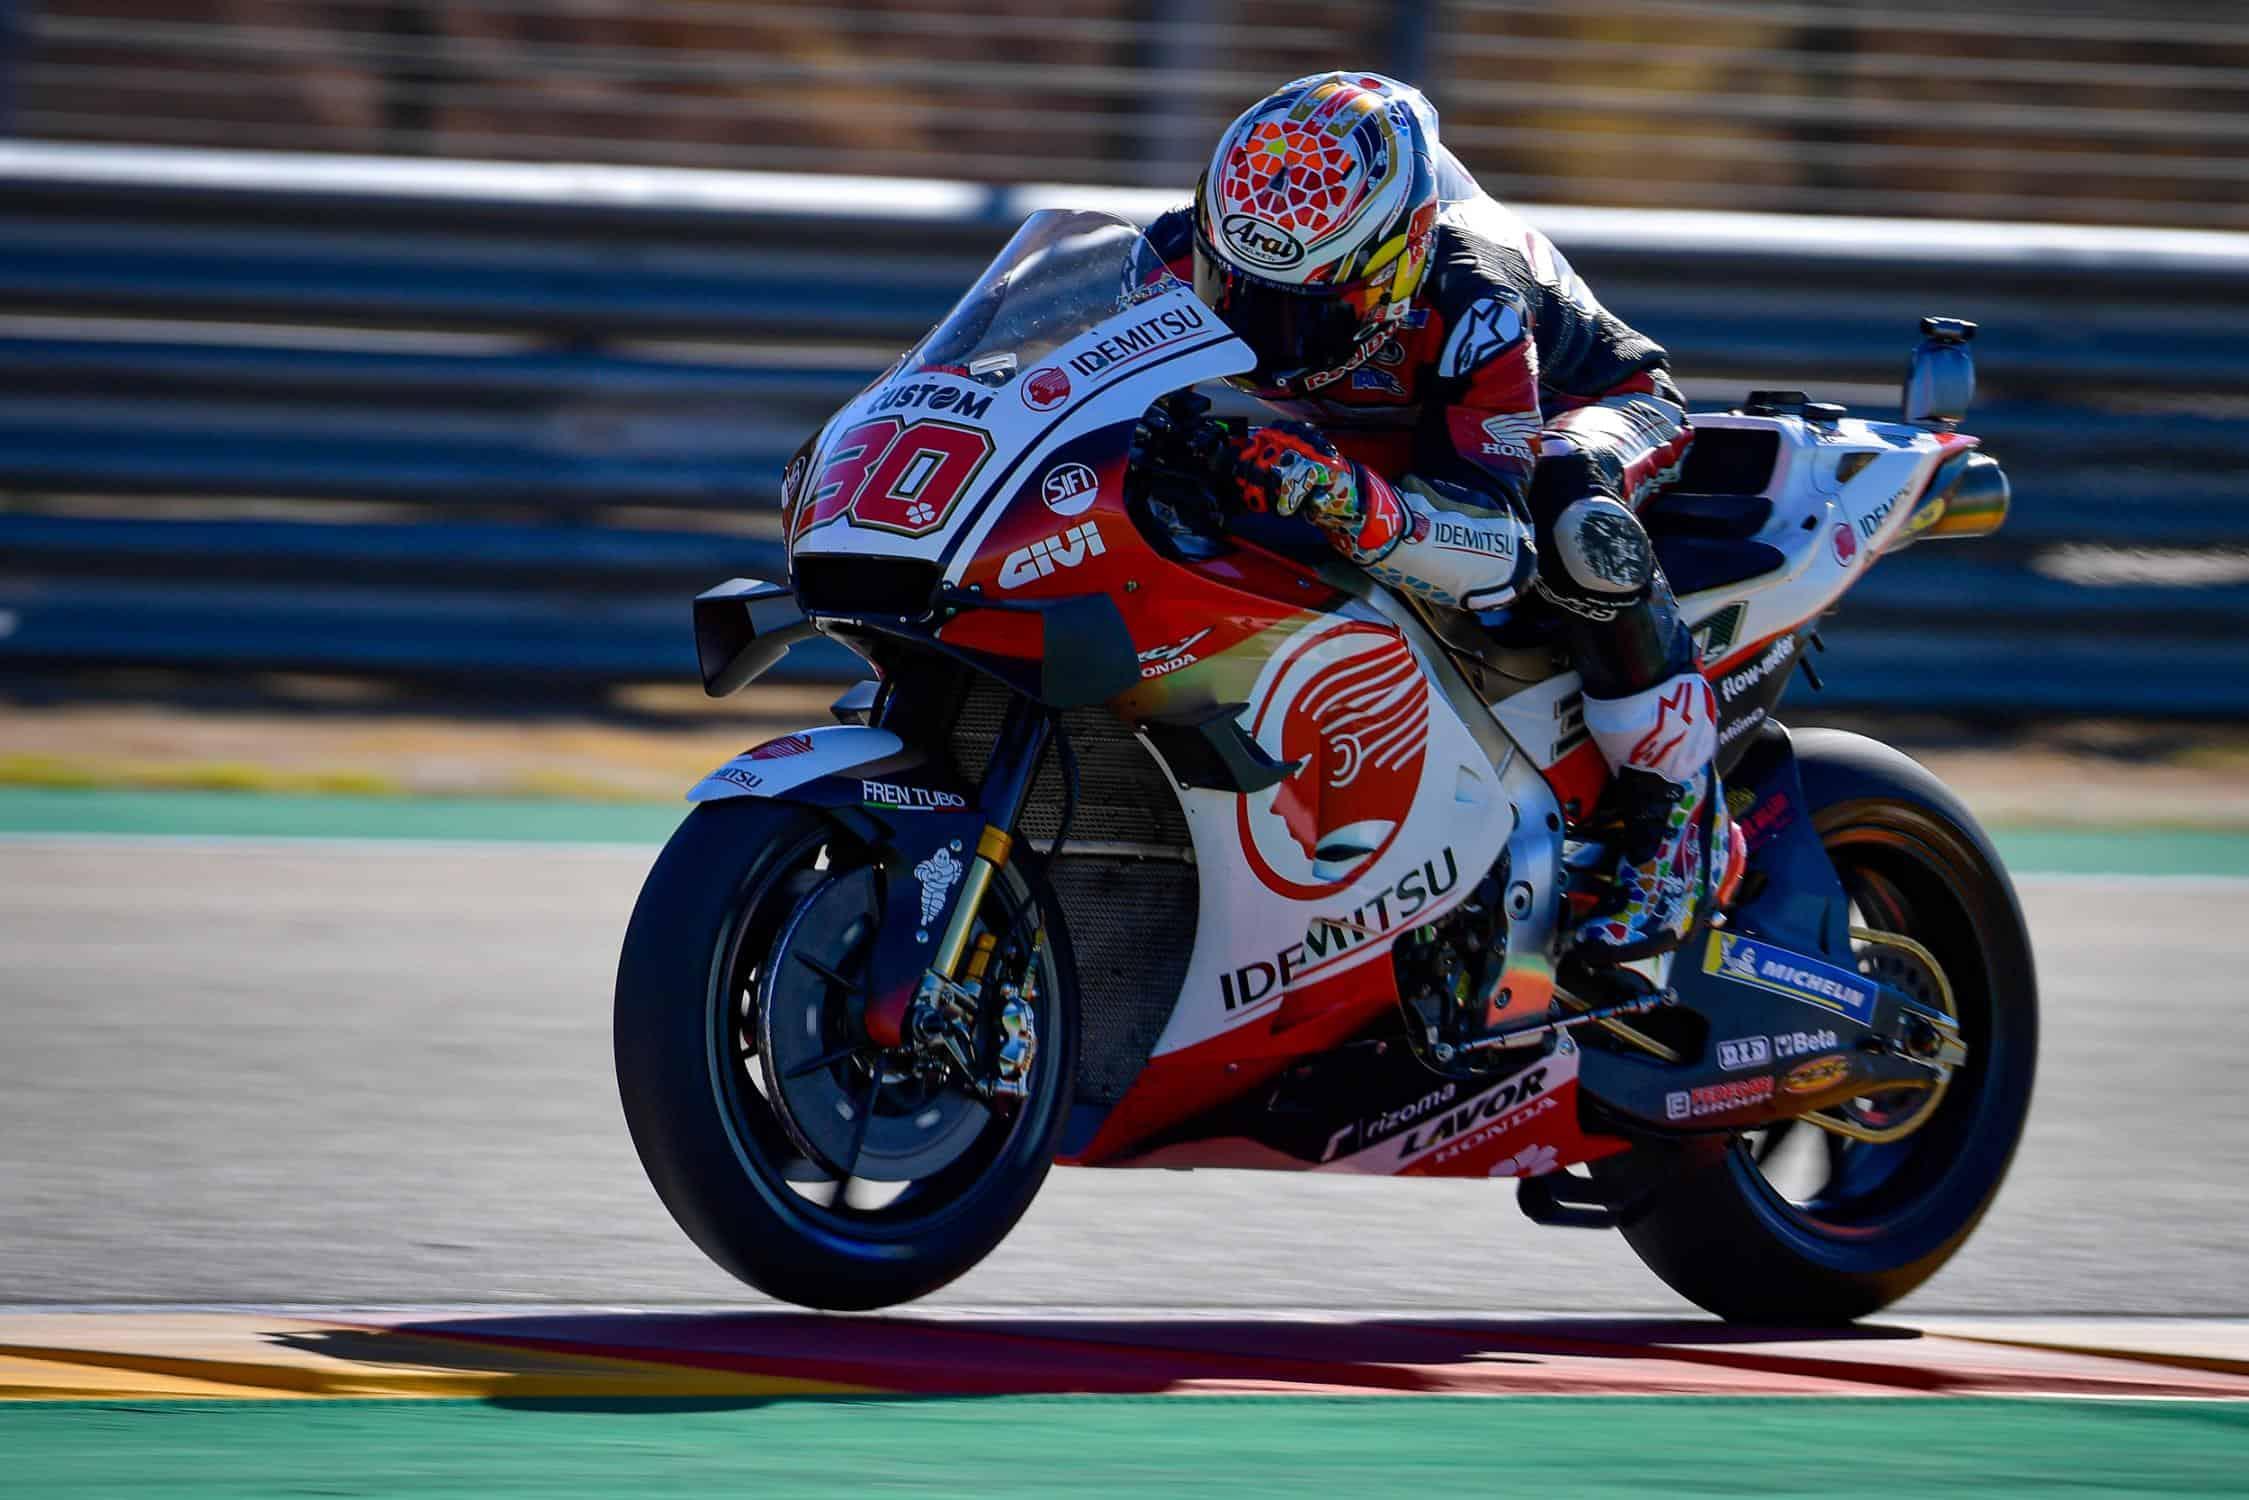 Prima pole in carriera in MotoGP per Takaaki Nakagami (foto da: motogp.com)